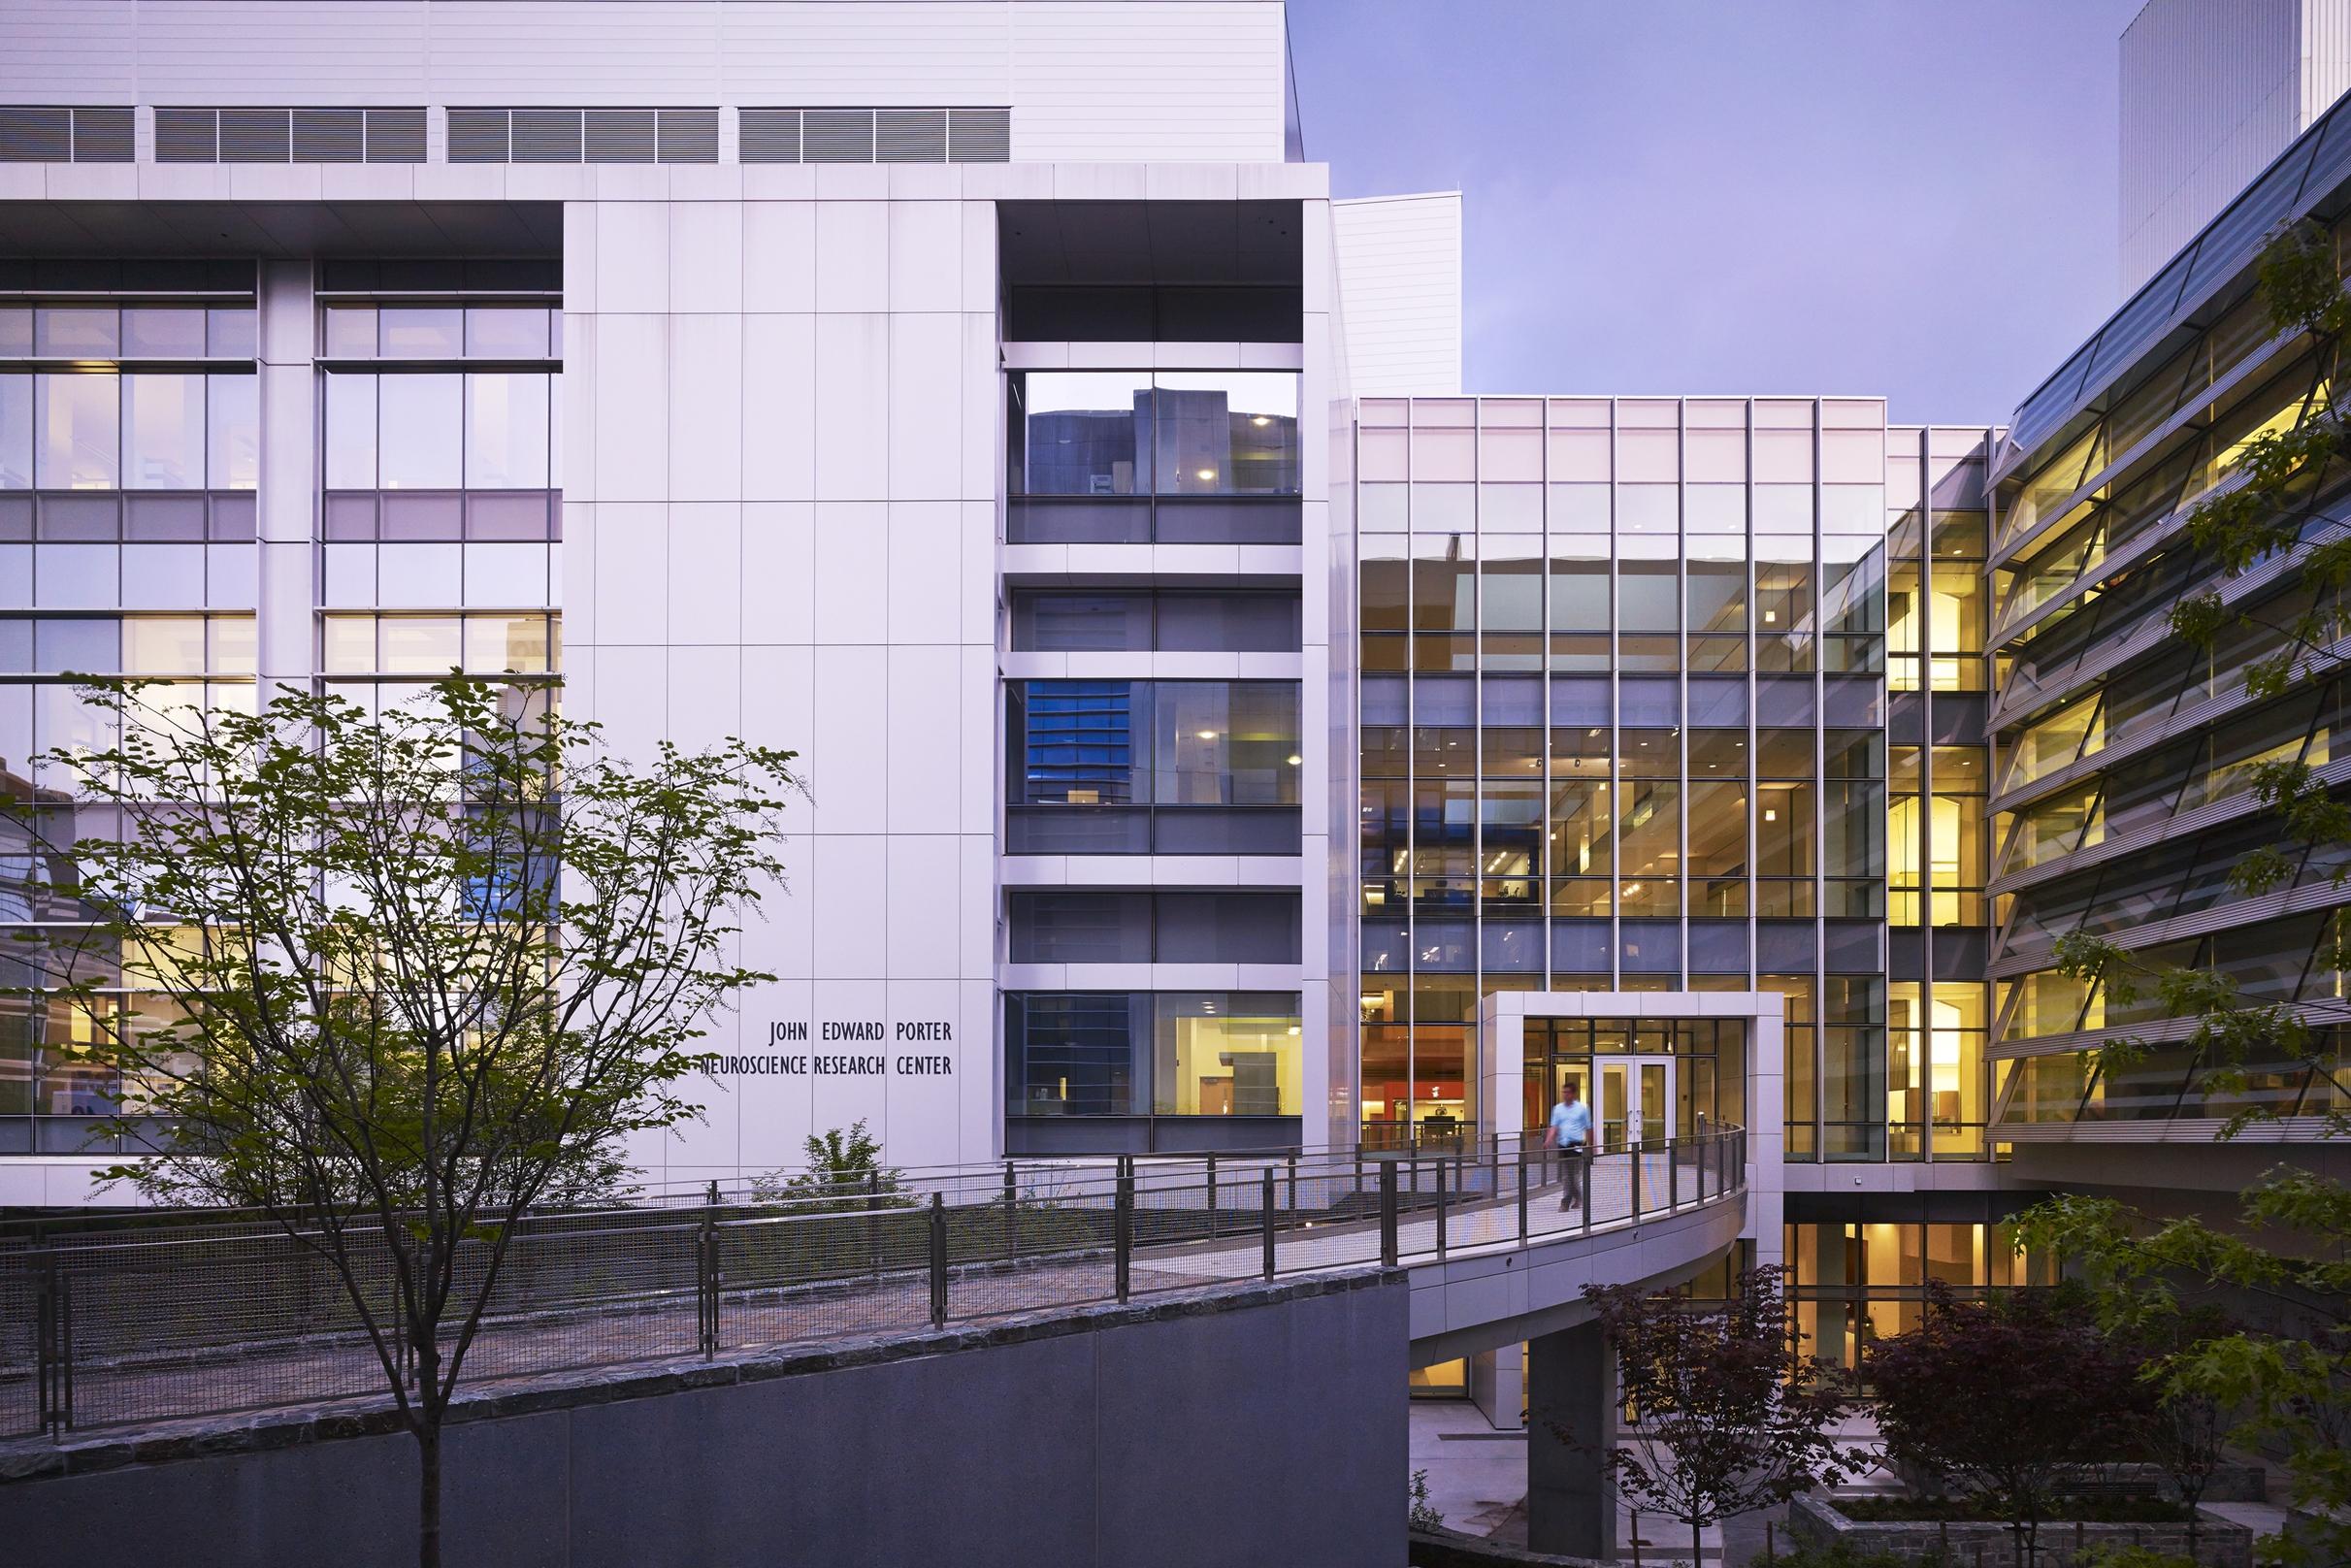 NIH Neuroscience Research Center